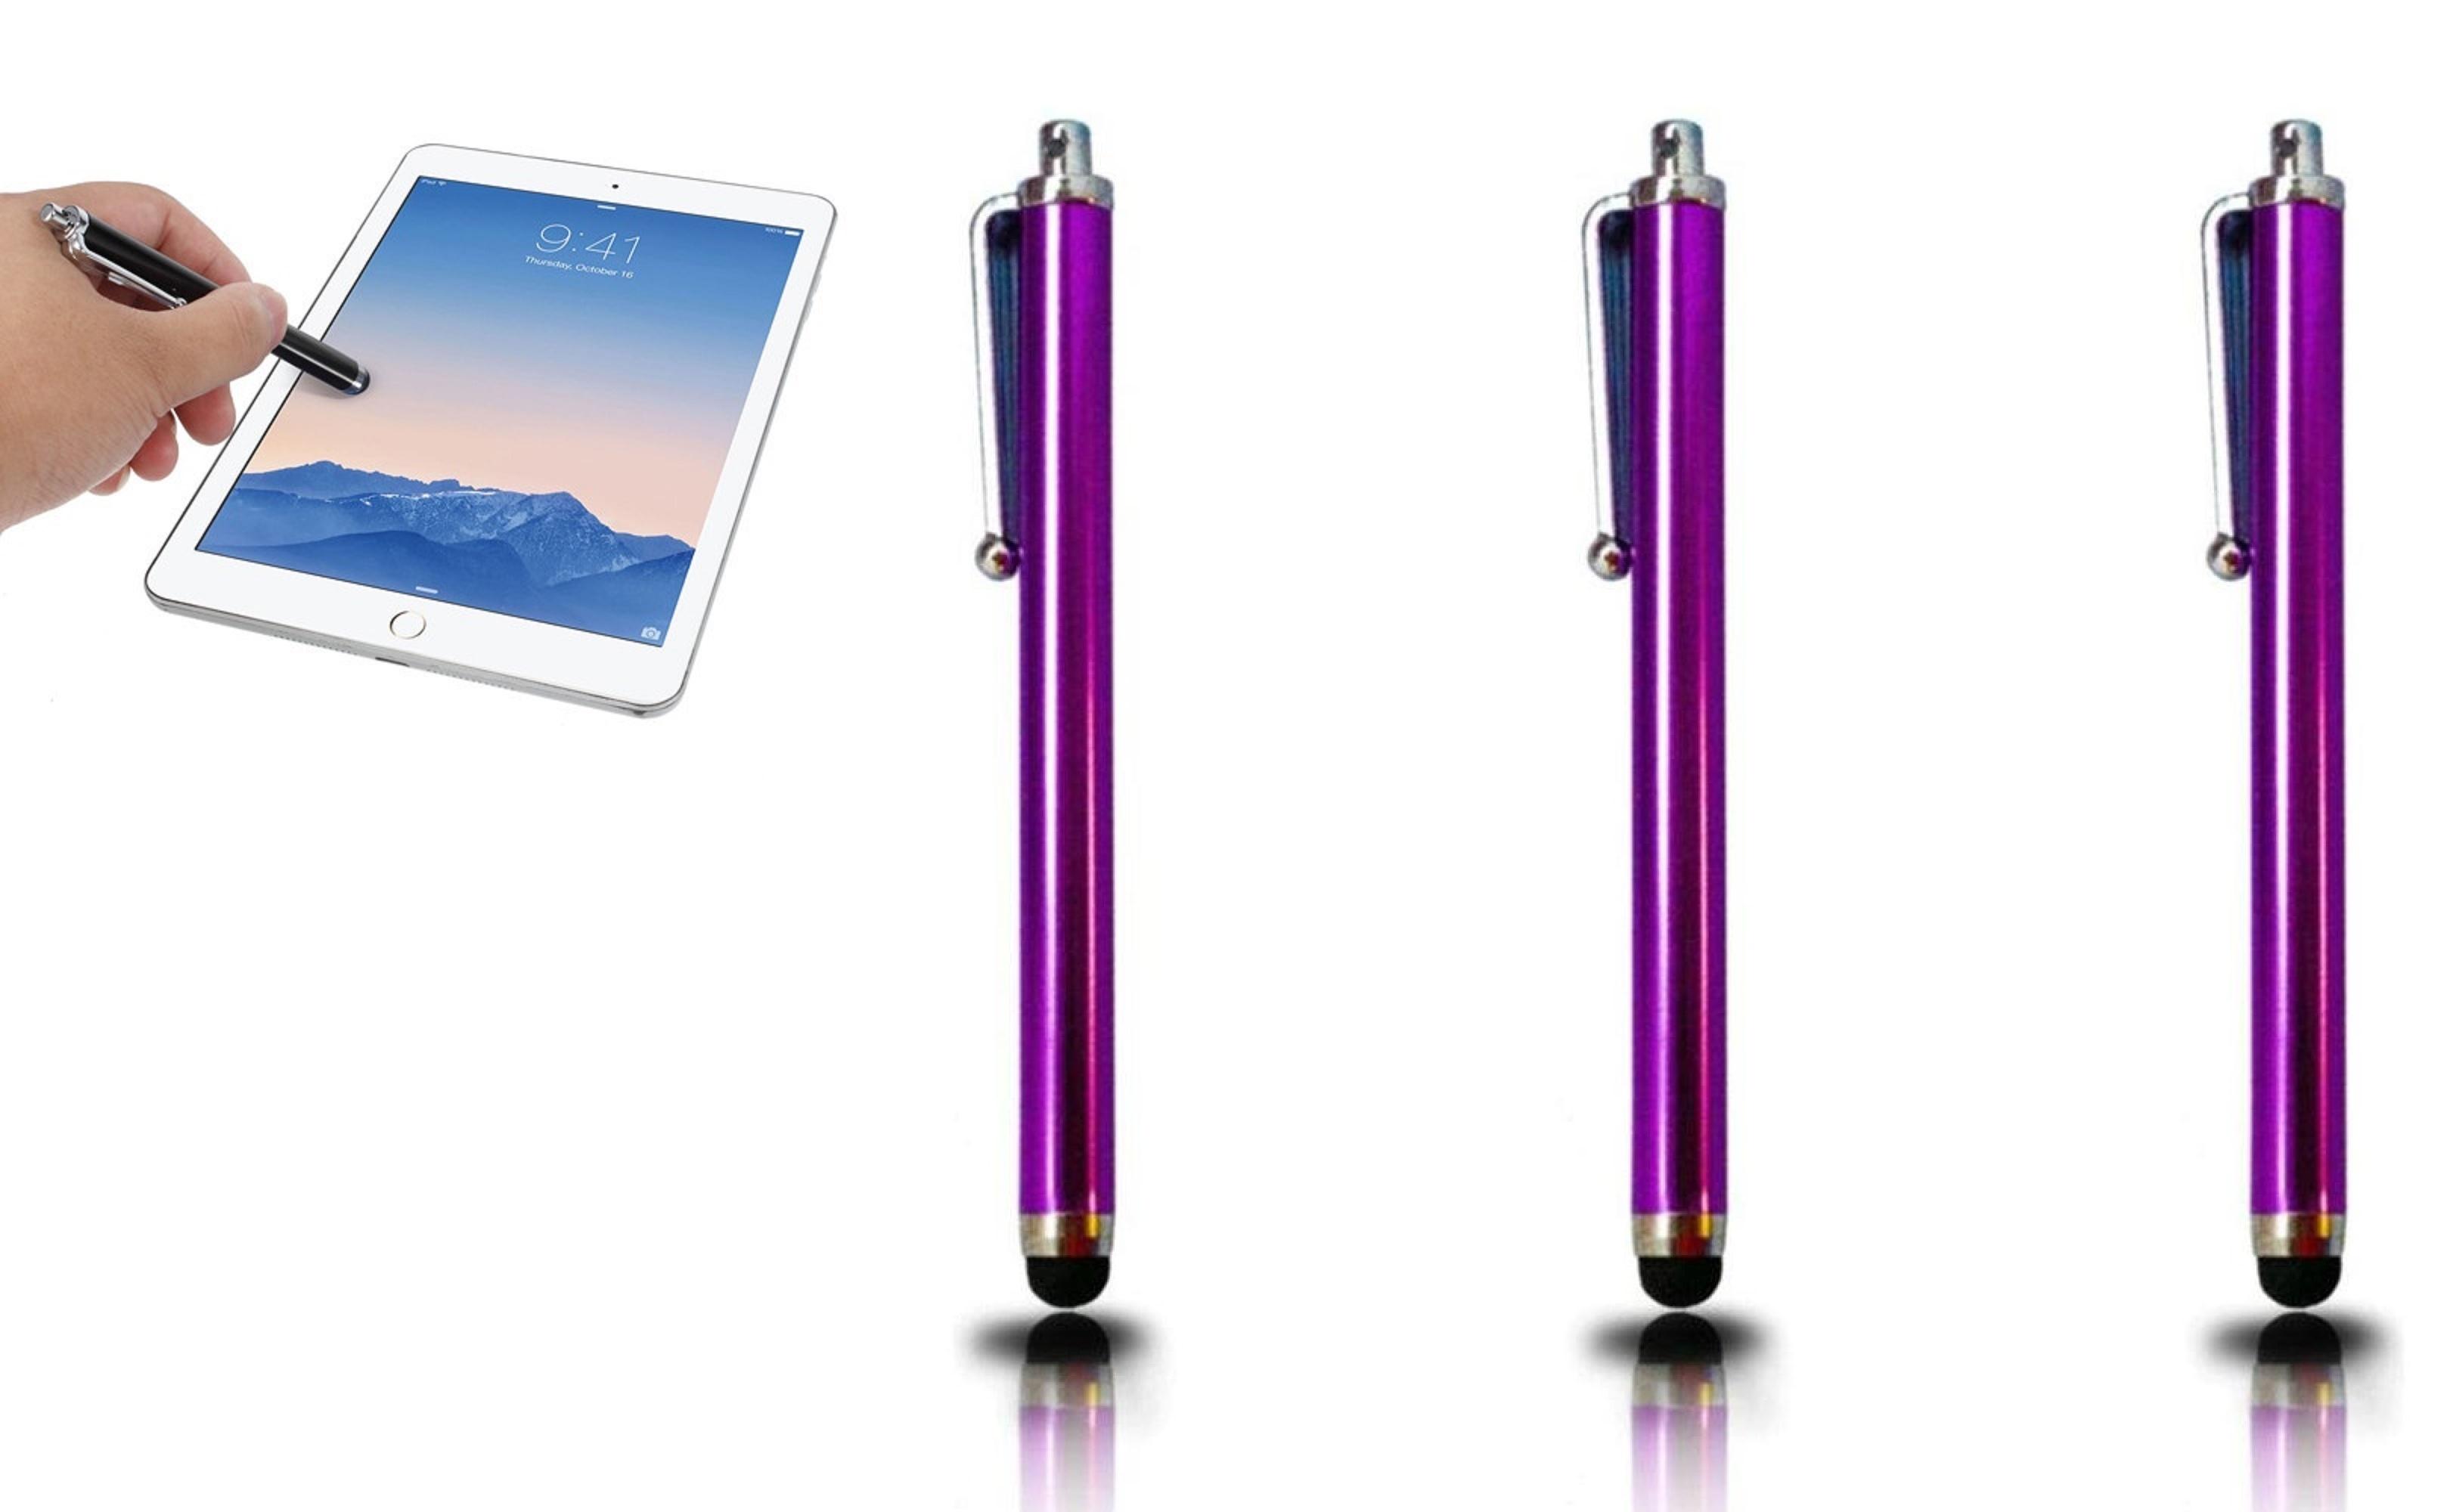 3x stylus touch pen eingabestift display stift f r toshiba medion acer asus hp ebay. Black Bedroom Furniture Sets. Home Design Ideas